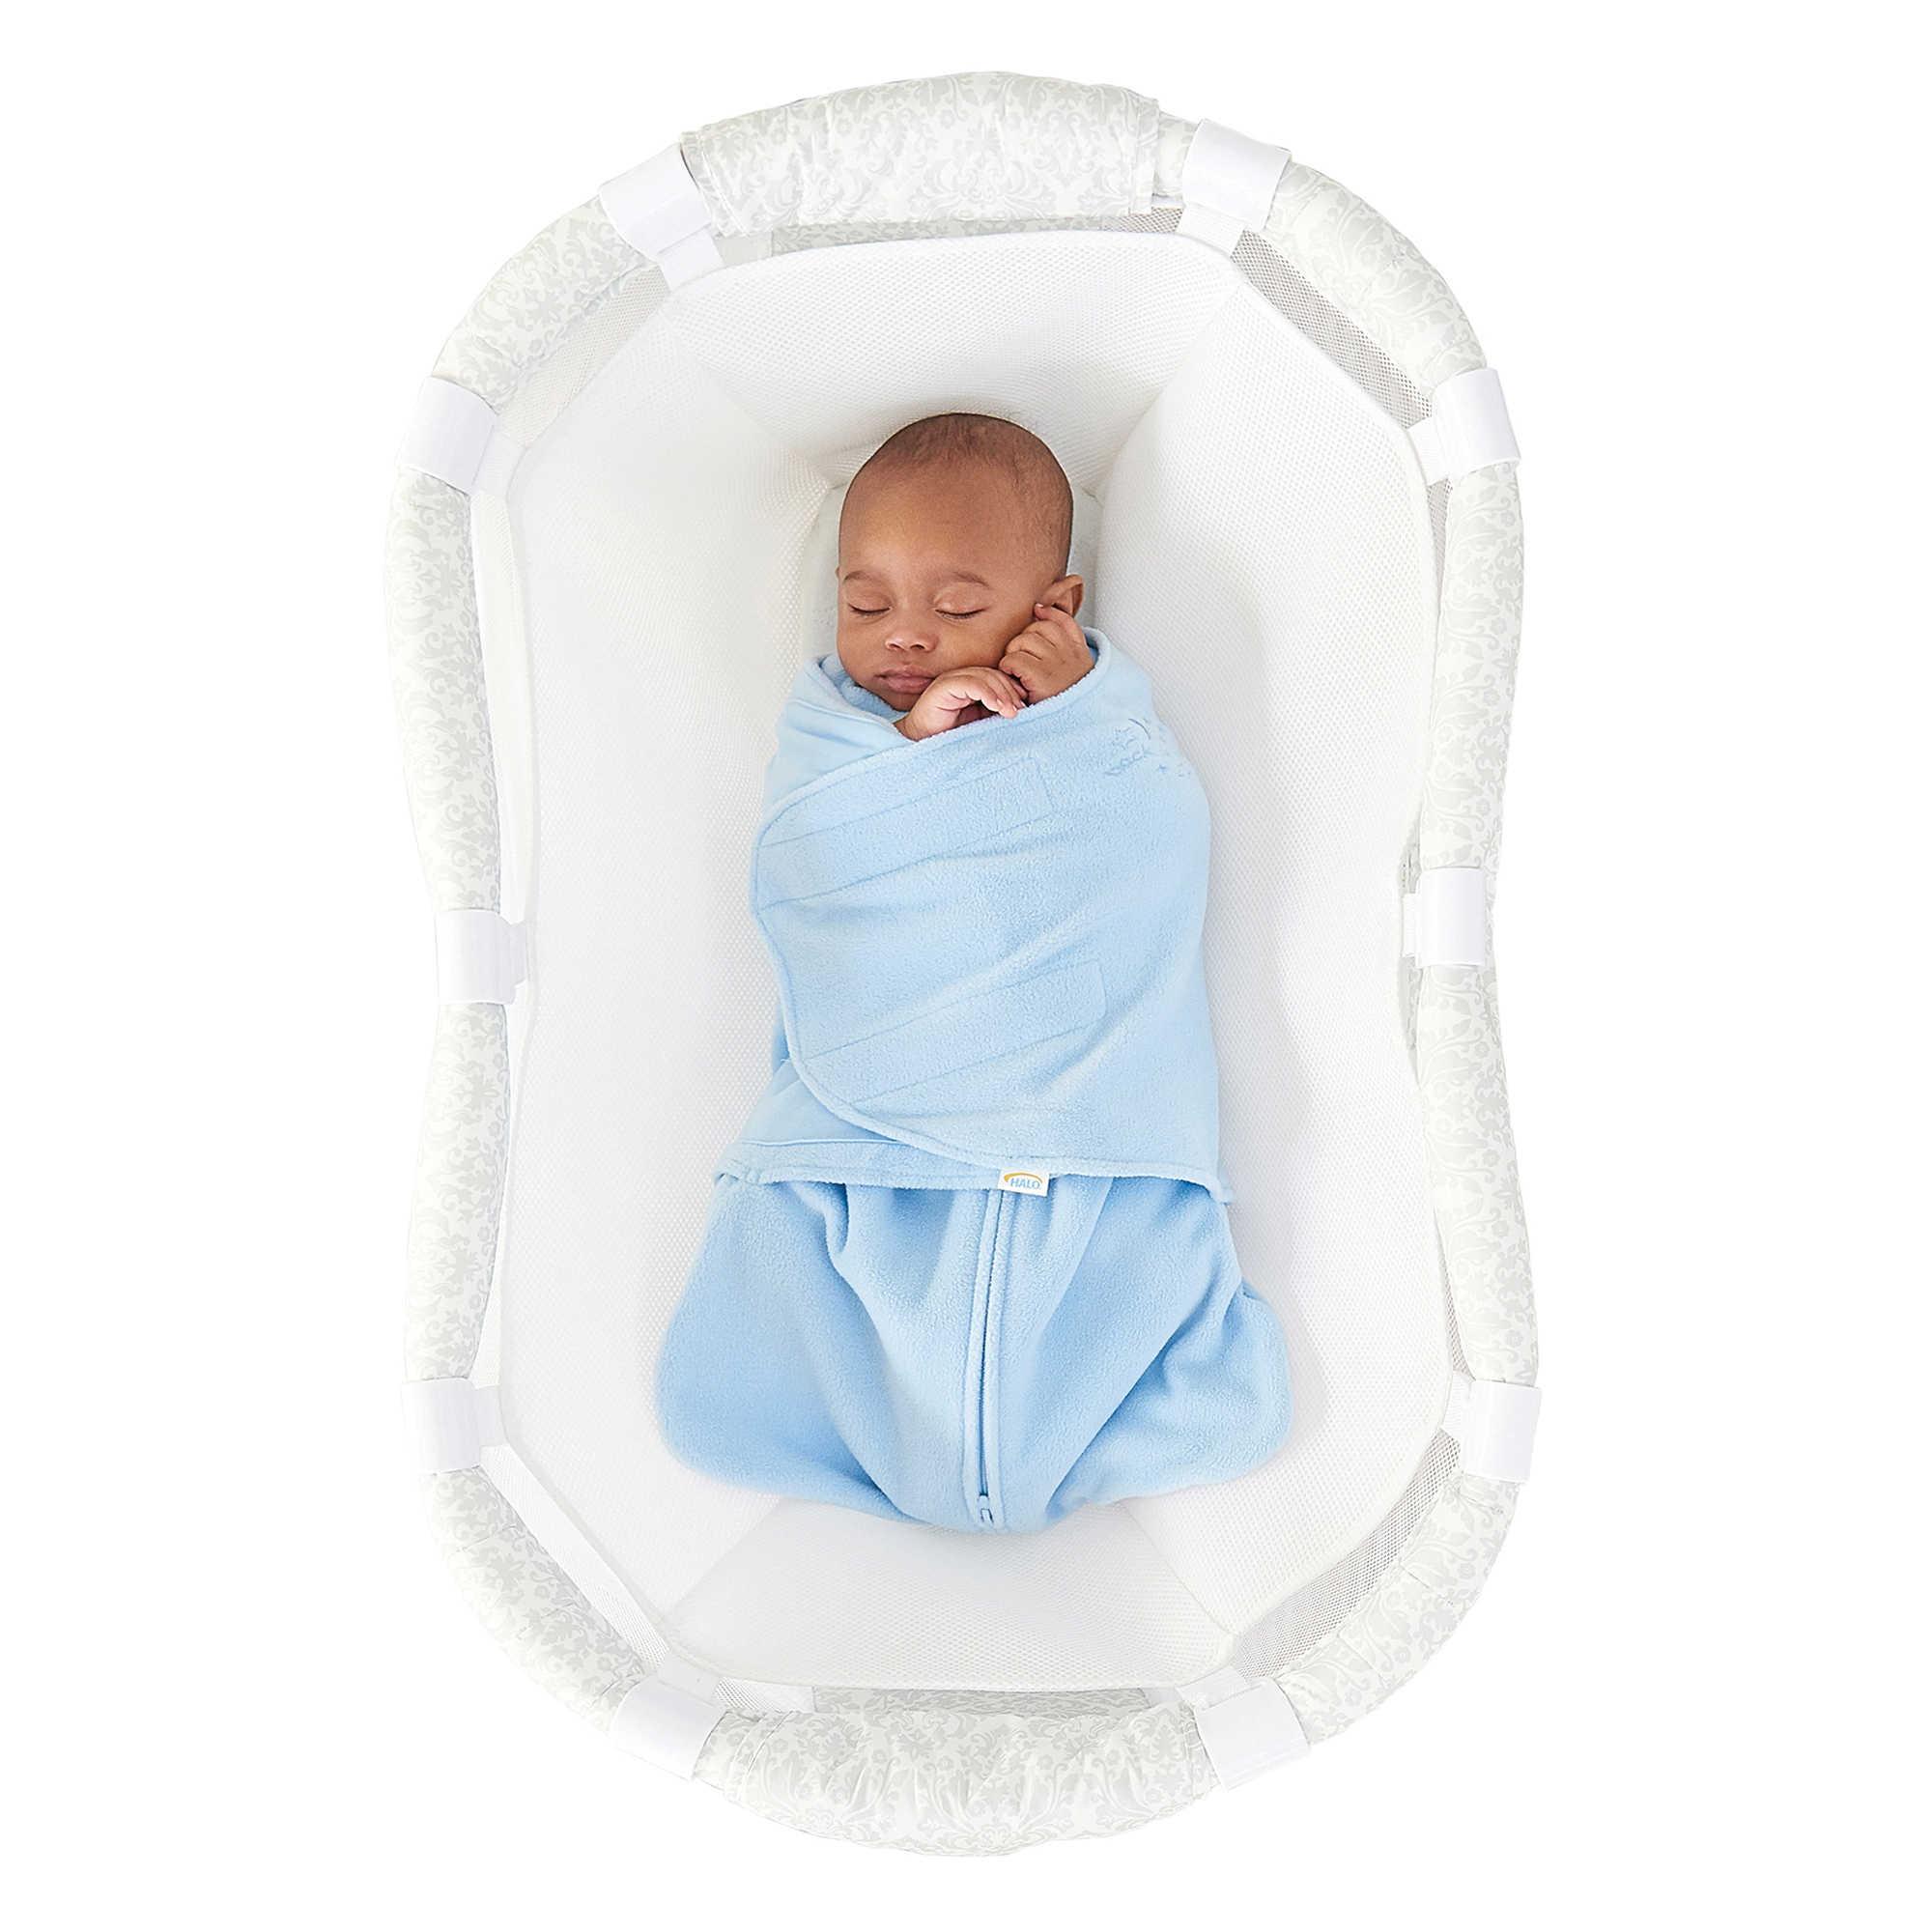 HALO® Bassinest® Newborn Insert in White - buybuy BABY